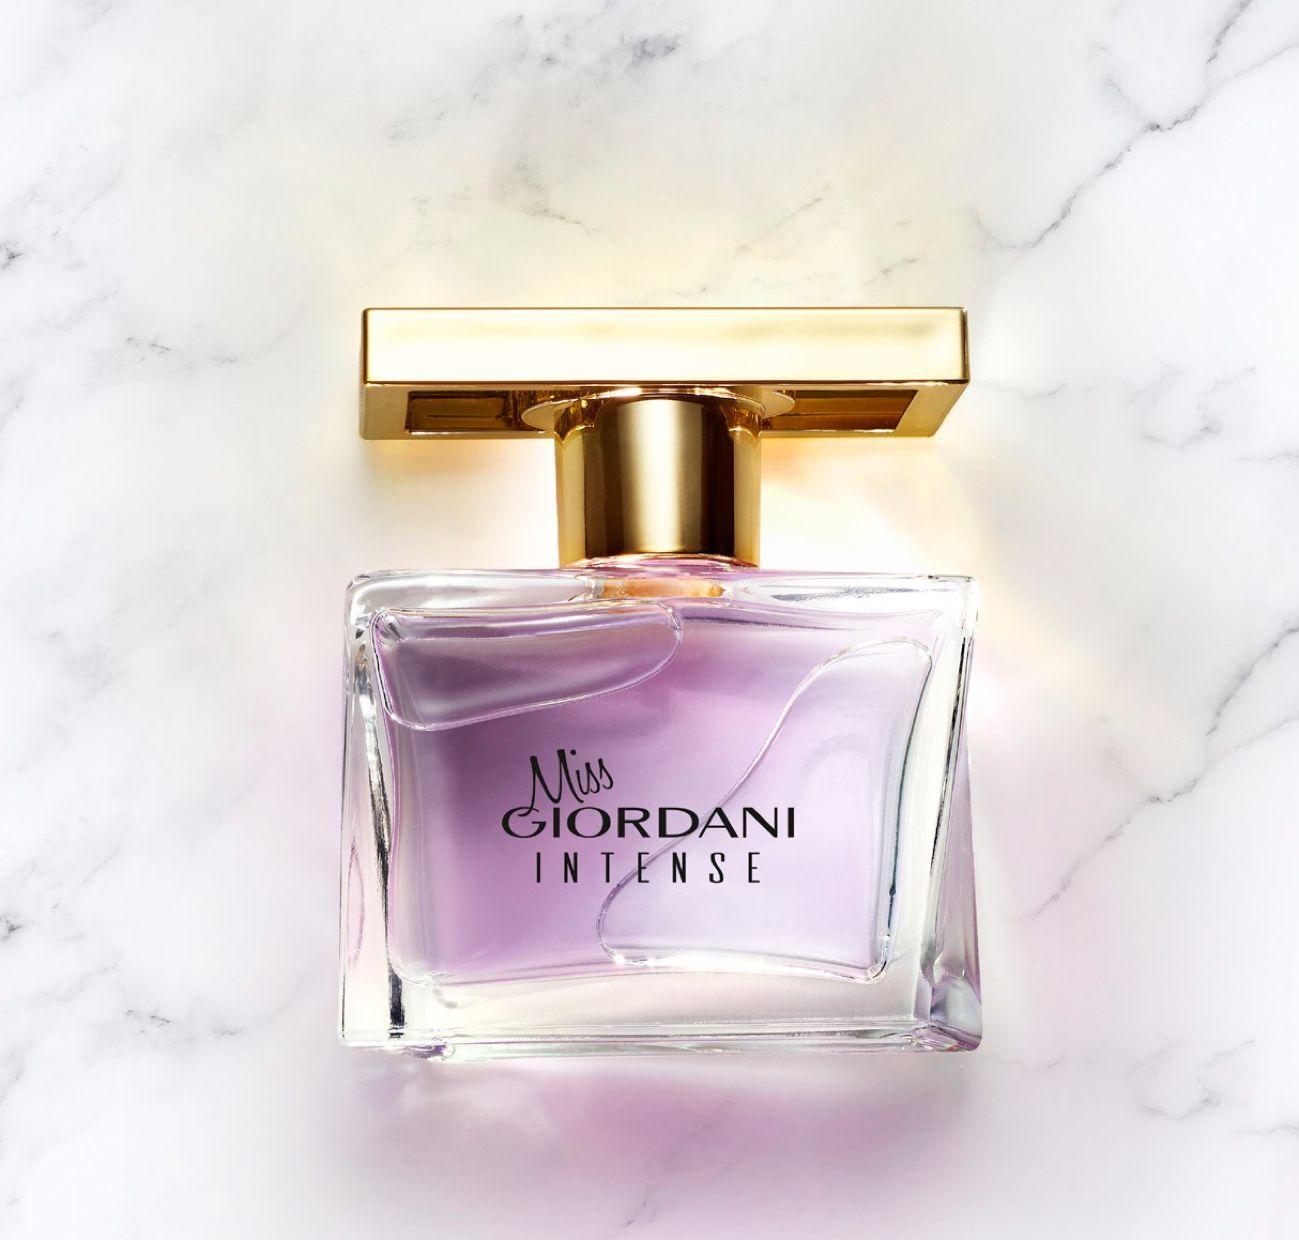 Miss Giordani Intense Oriflame аромат новый аромат для женщин 2018